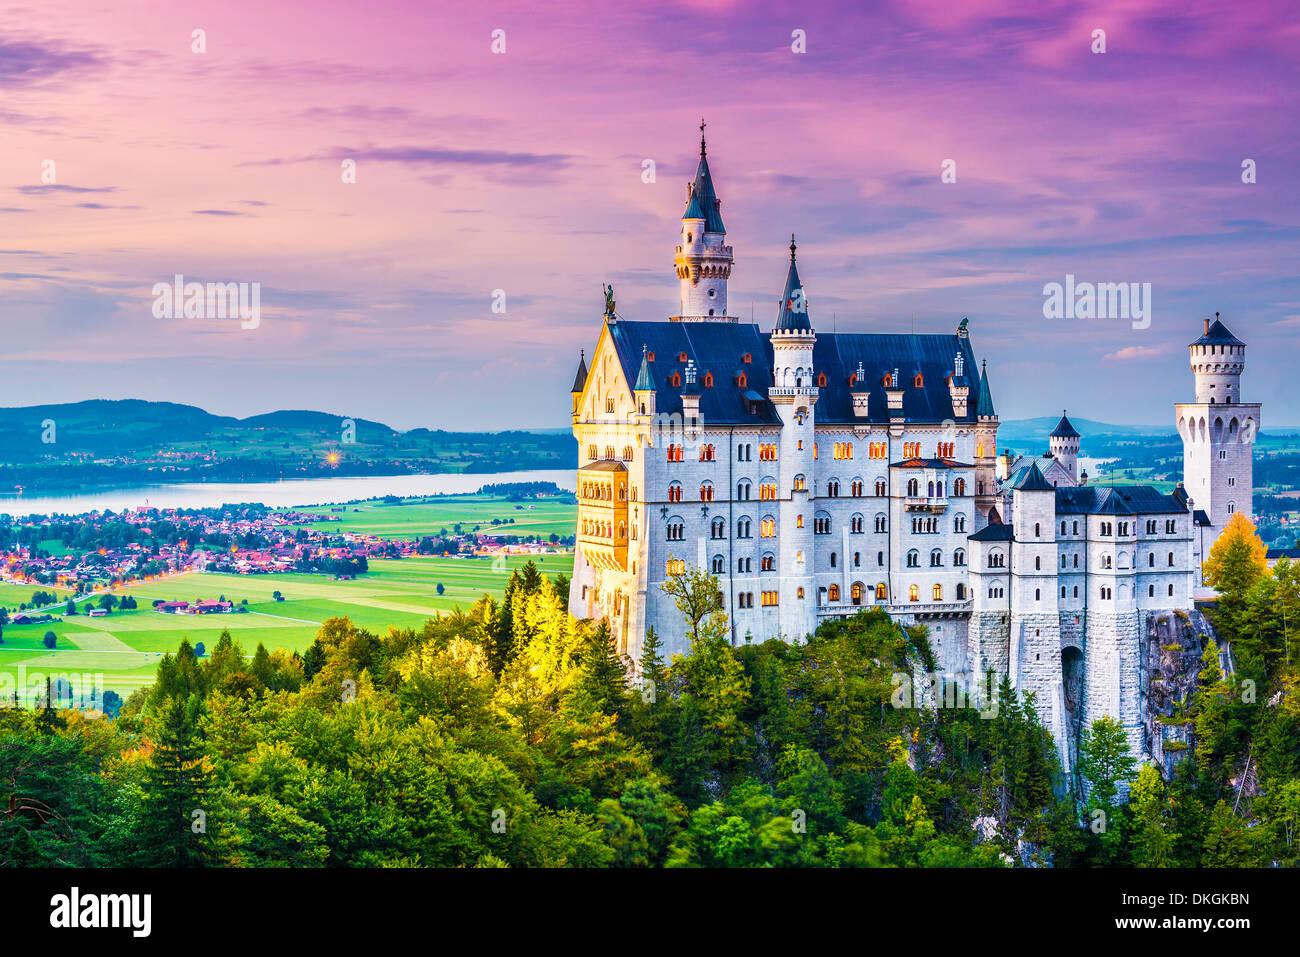 Neuschwanstein Castle in Germany. - Stock Image